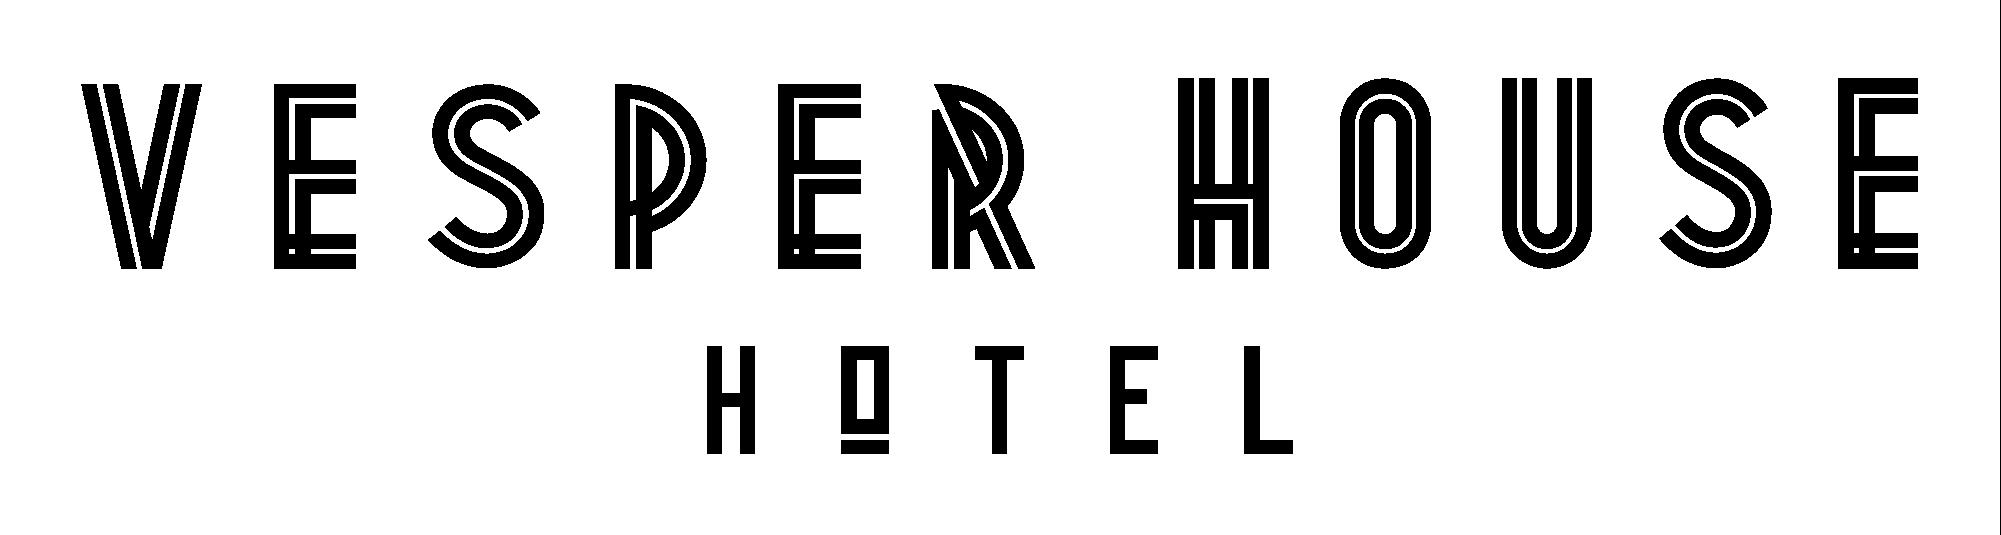 Vesper Logo